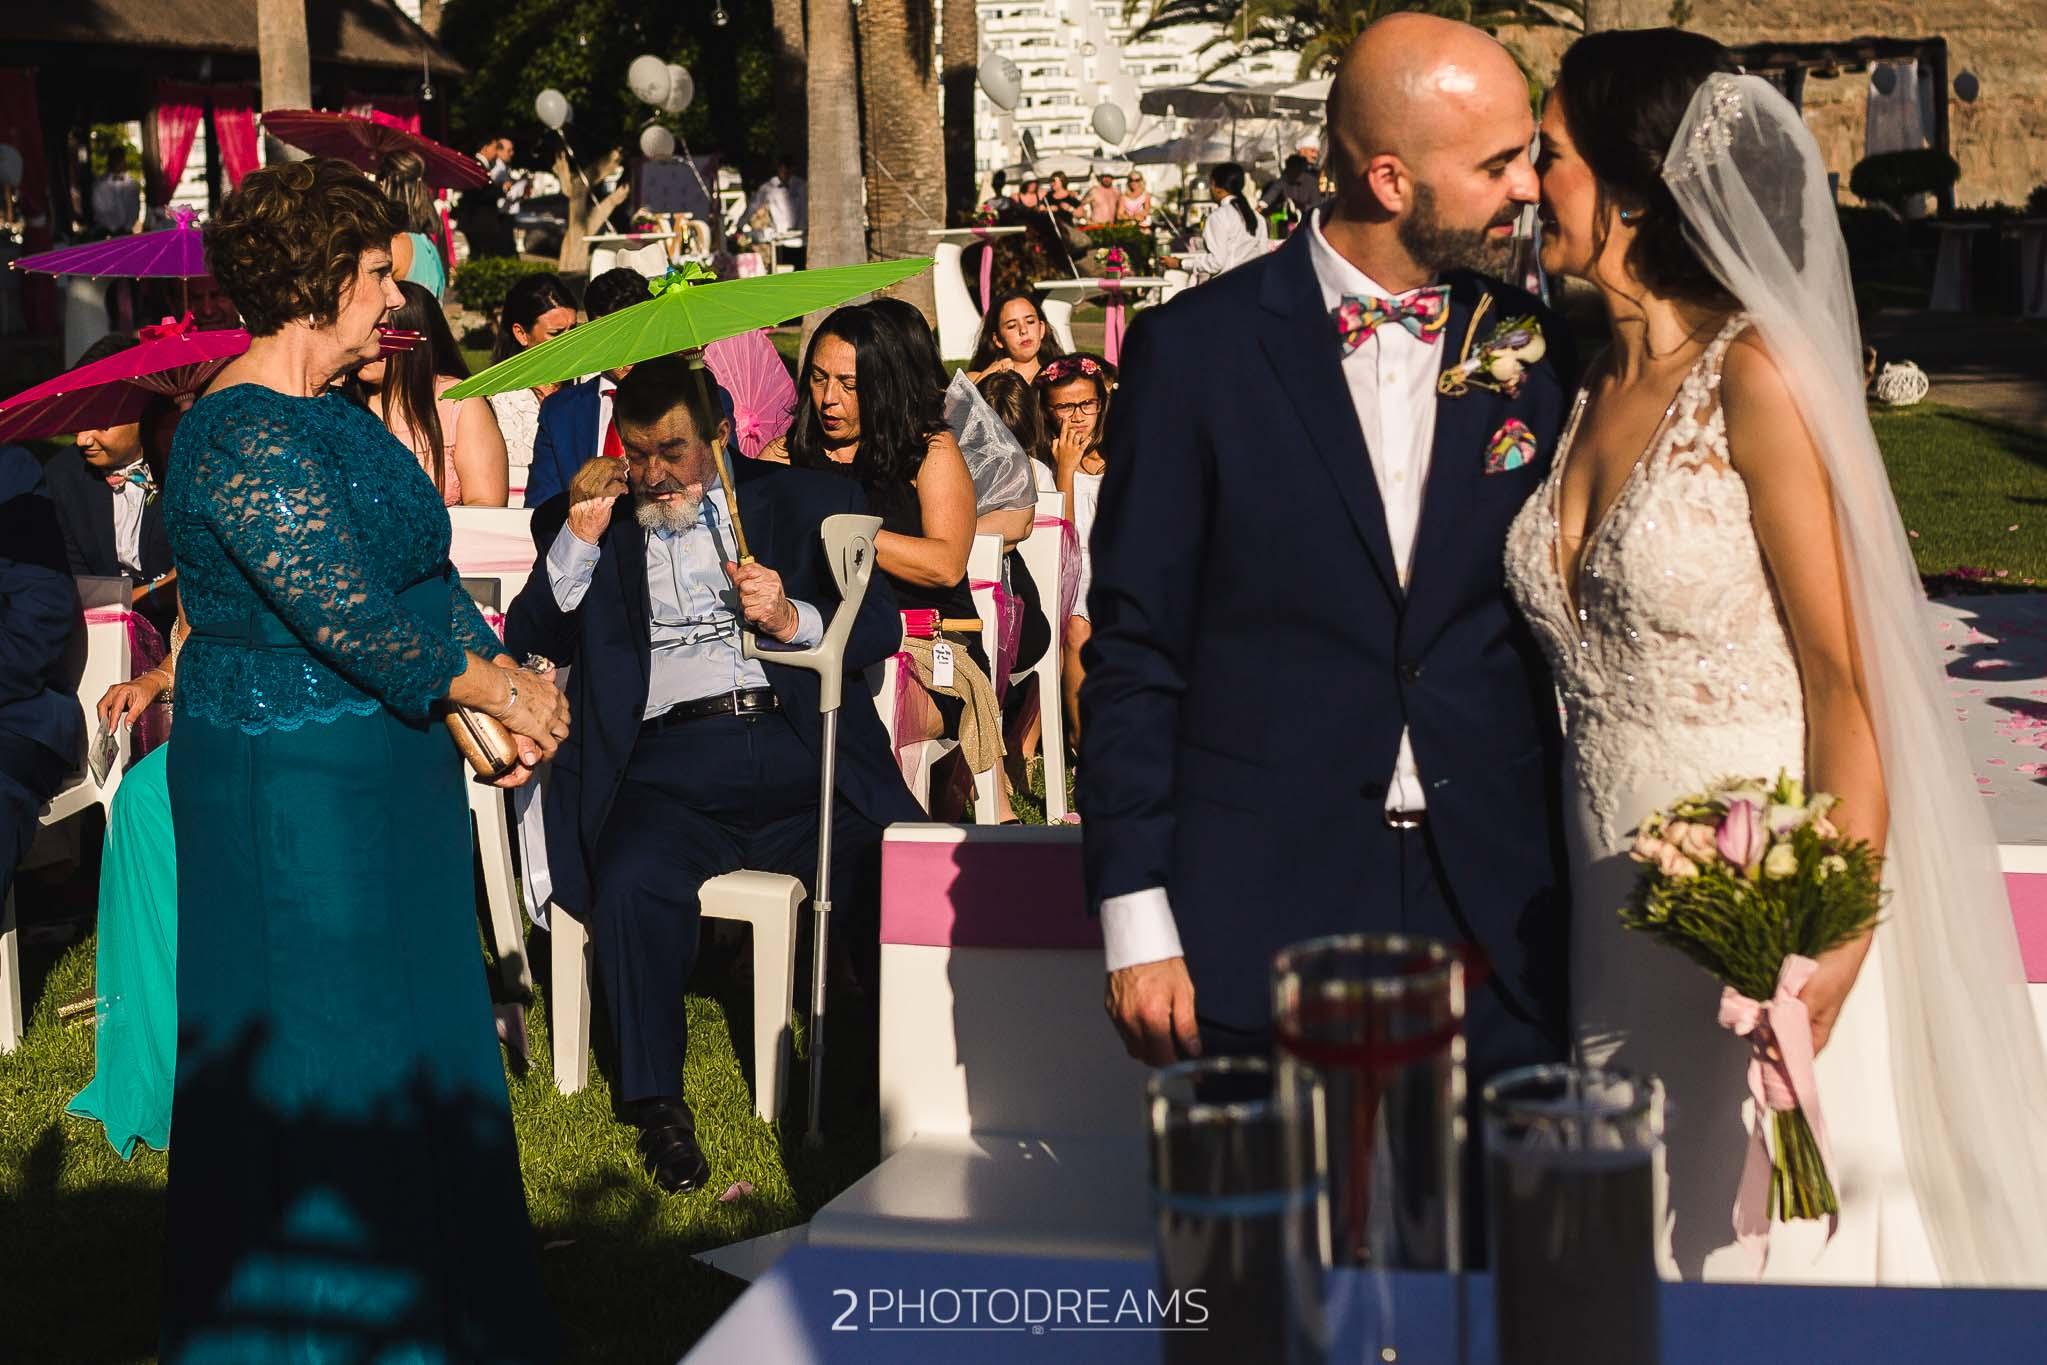 Wedding photographer Lincolnshire